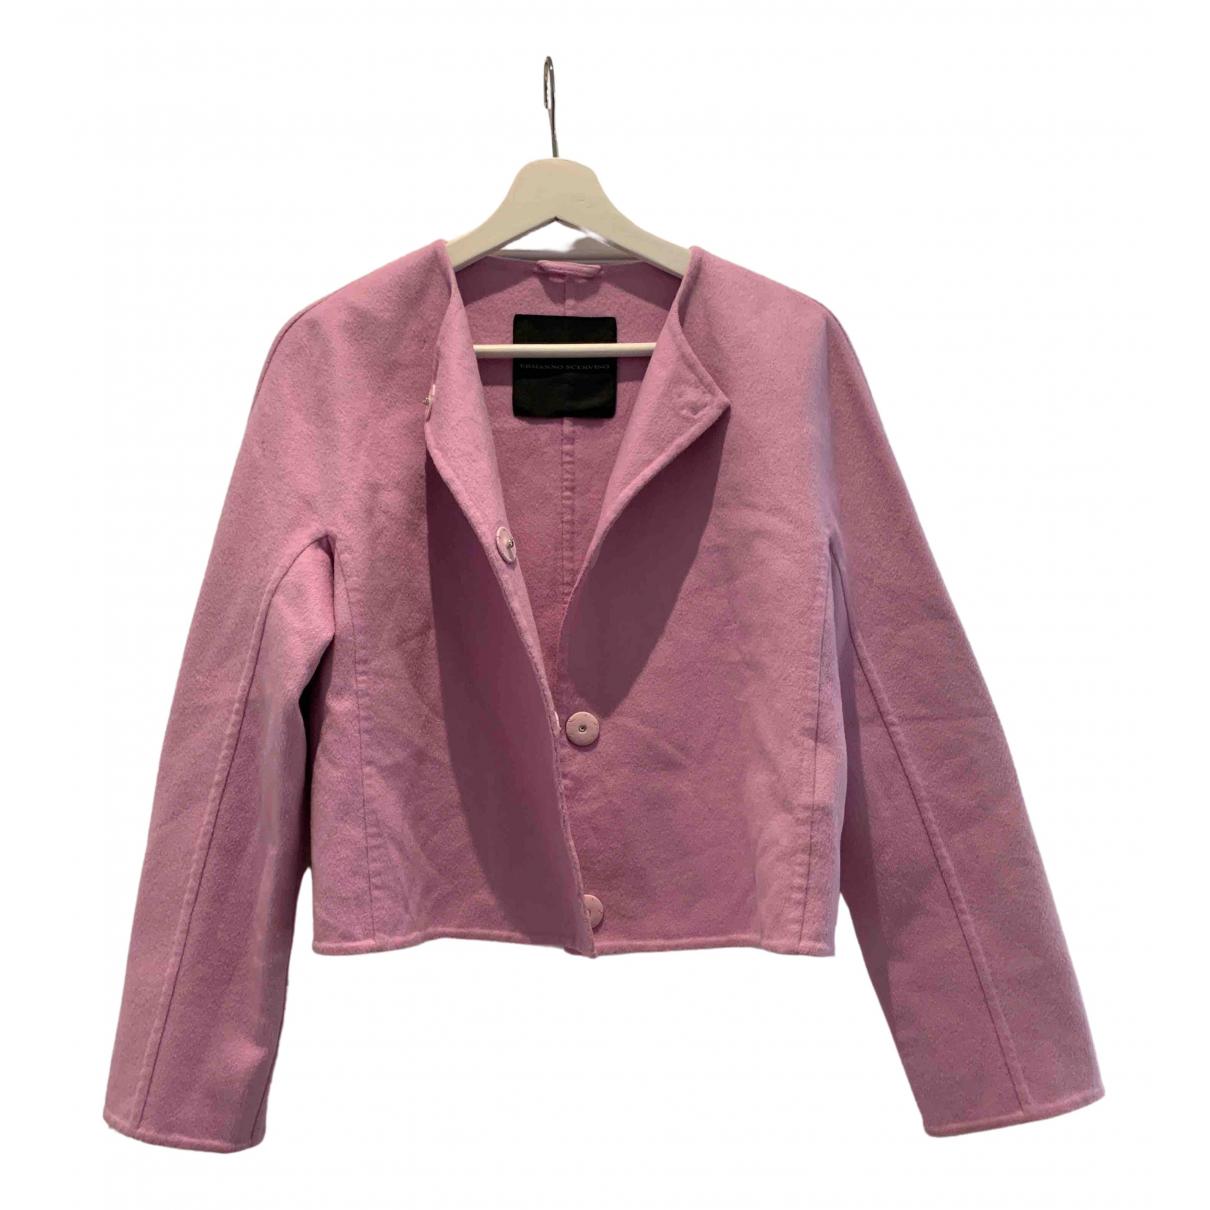 Ermanno Scervino \N Pink Wool jacket for Women 38 IT